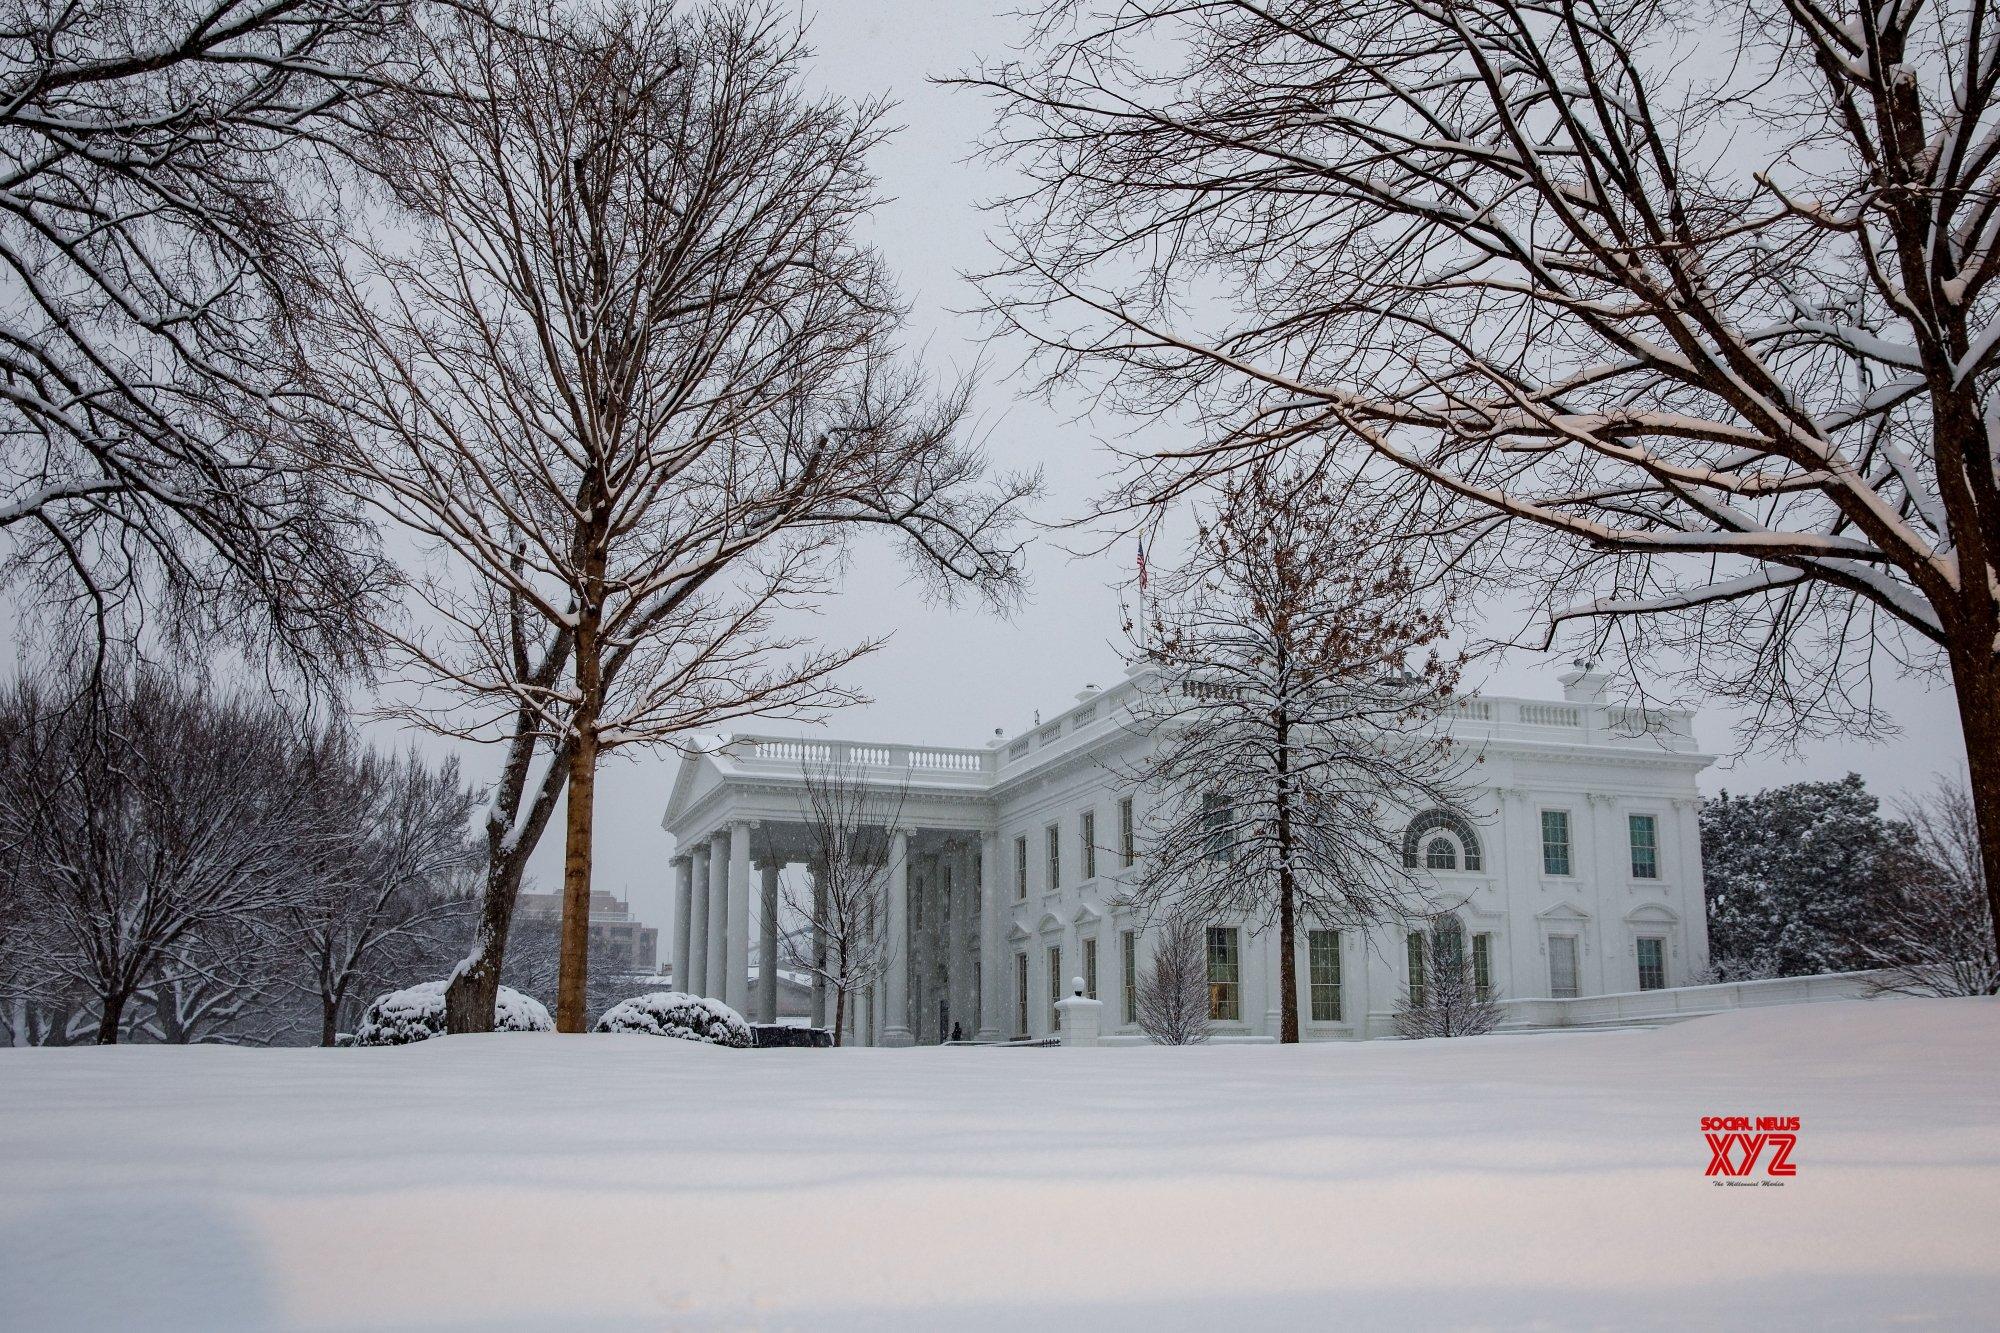 U.S. - WASHINGTON.D.C. - SNOW #Gallery